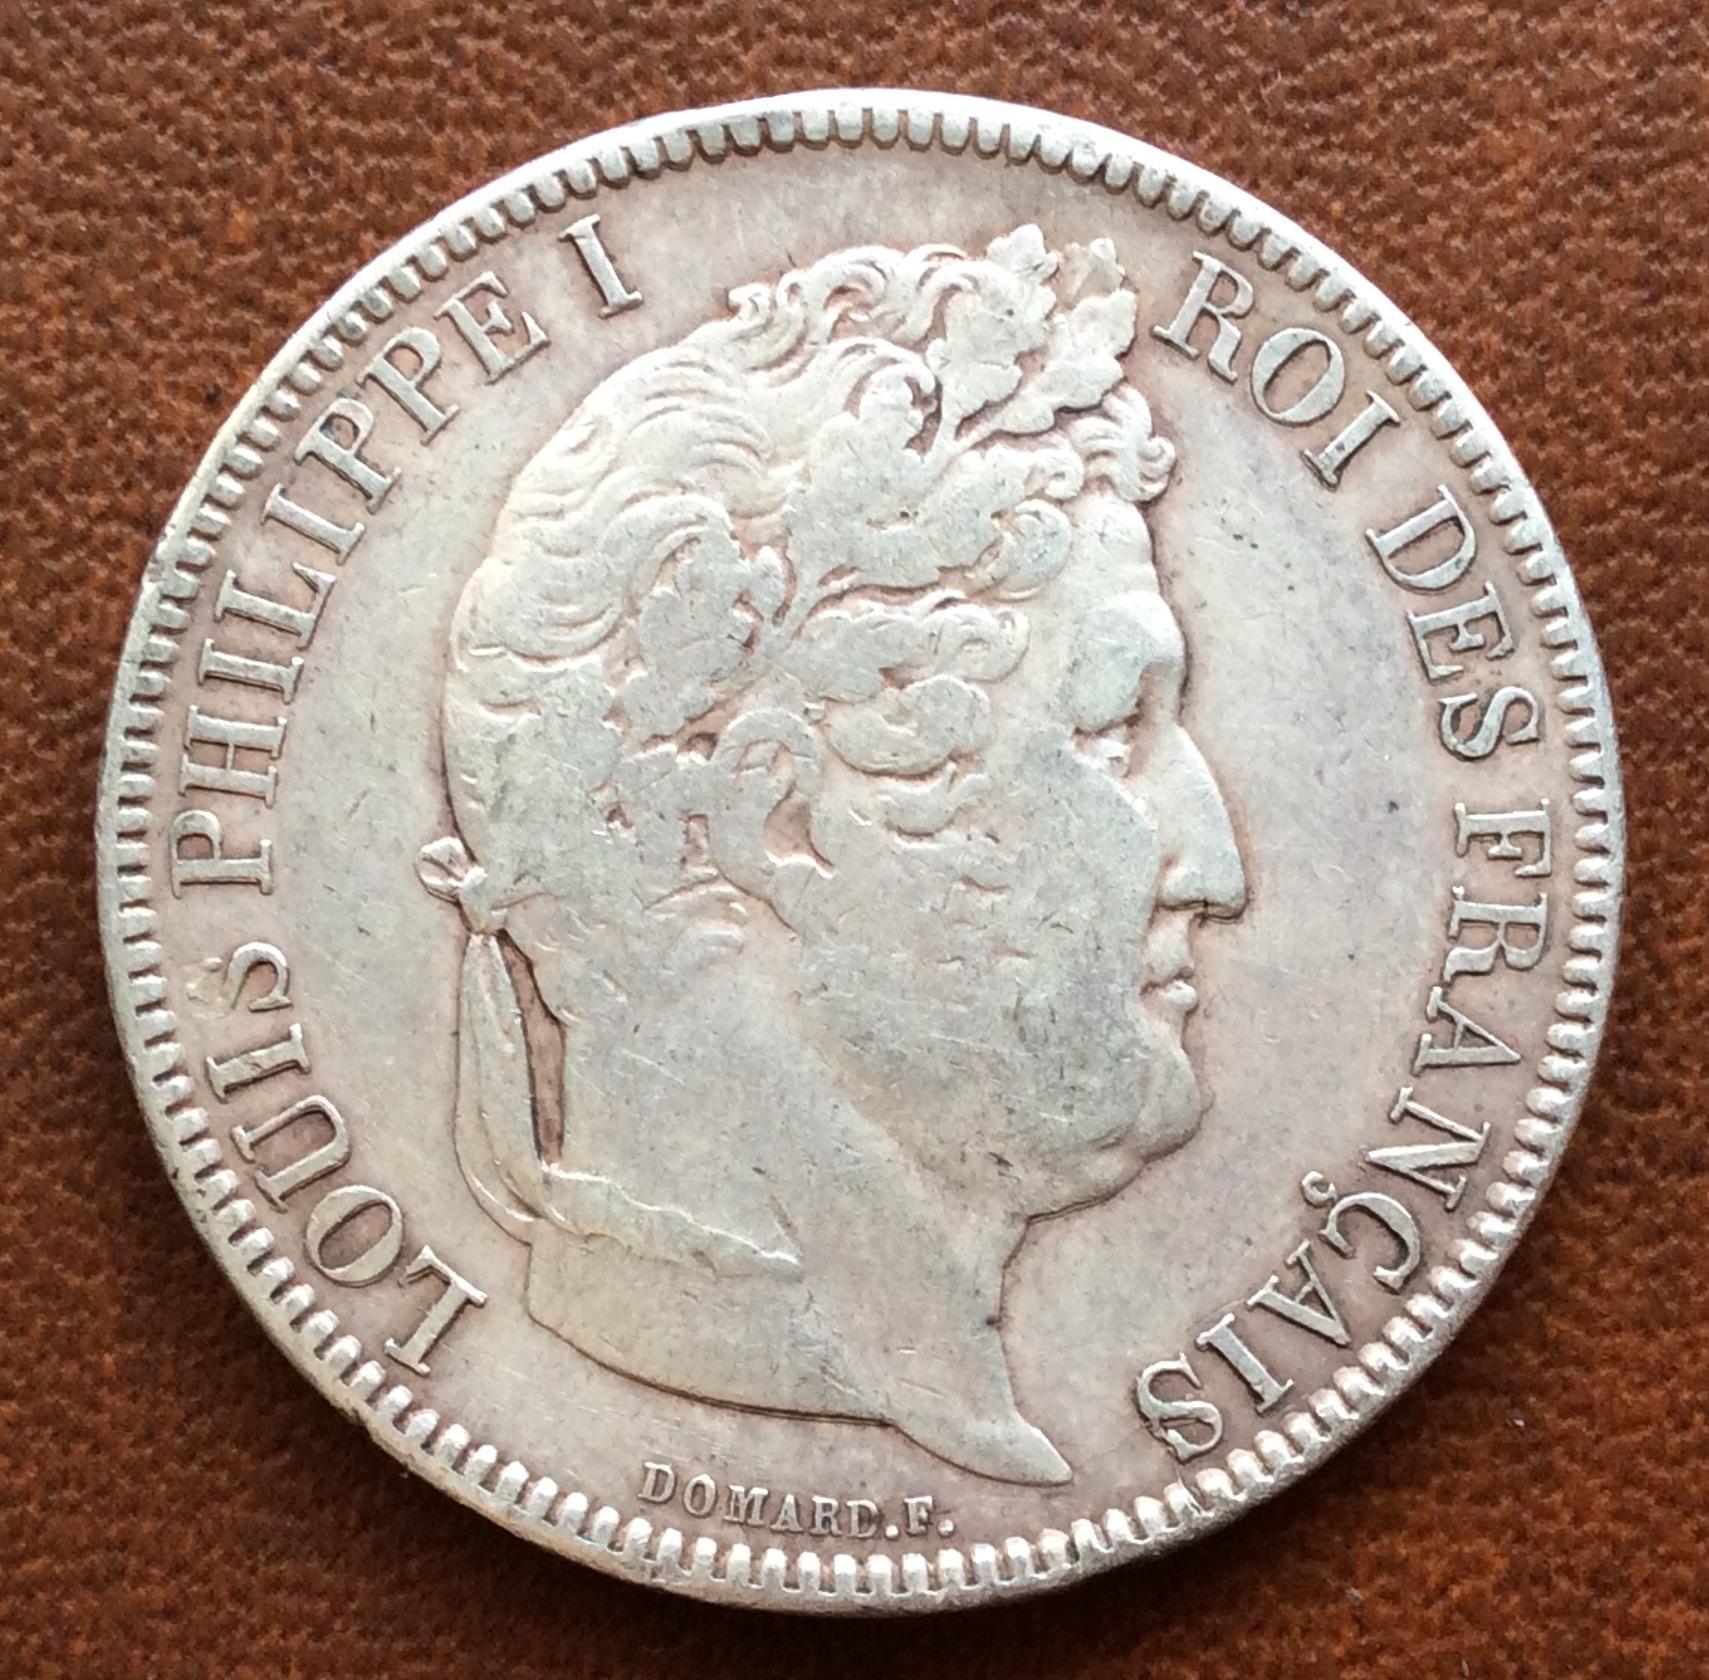 5 FRANCOS DE PLATA DE 1831 - LUIS FELIPE I - FRANCIA